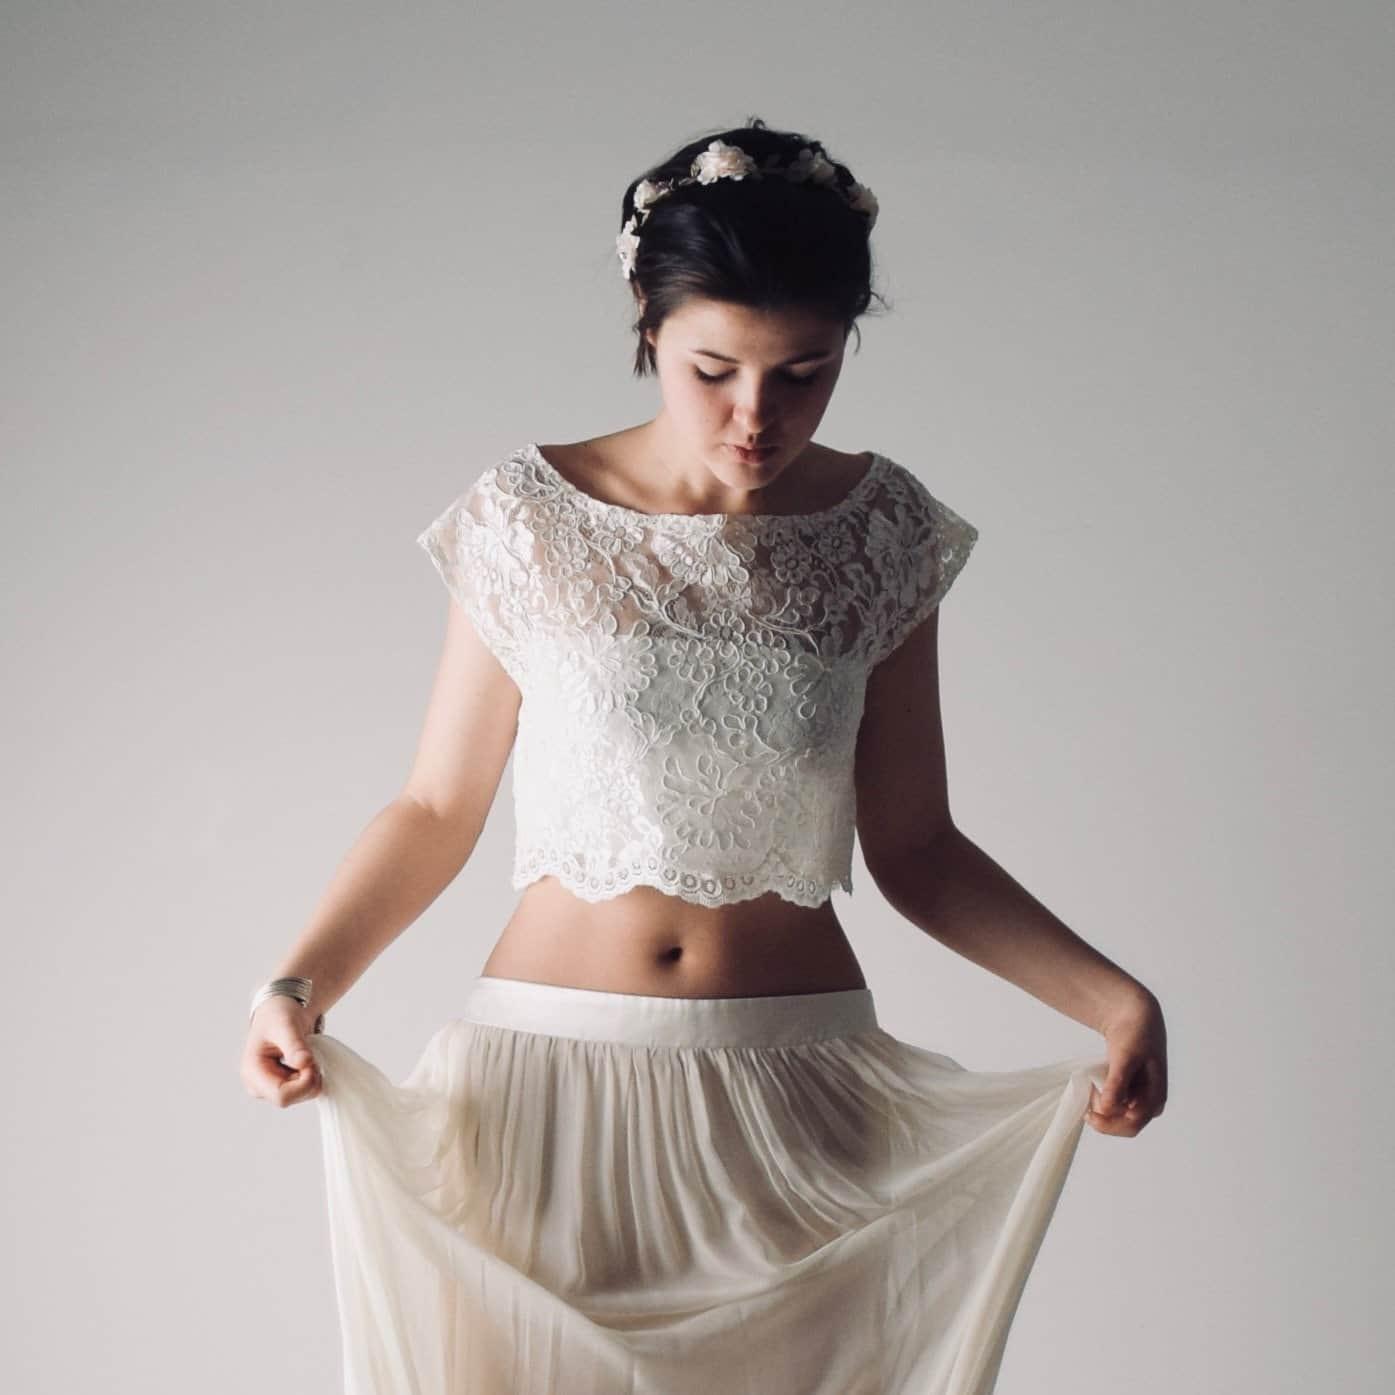 Boho abito sposa due pezzi